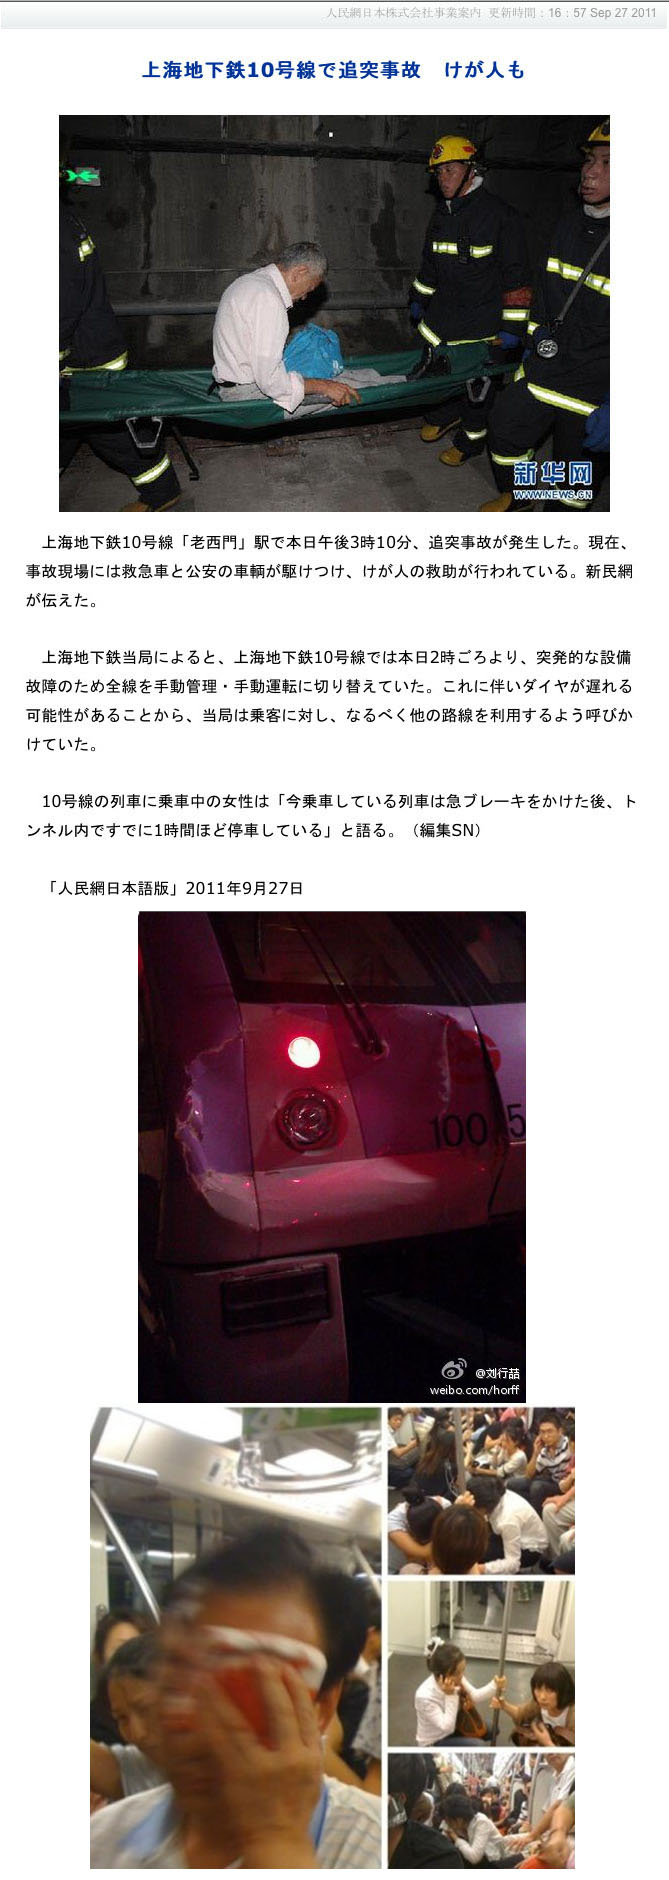 上海の地下鉄10号線で追突事故_a0127552_97720.jpg